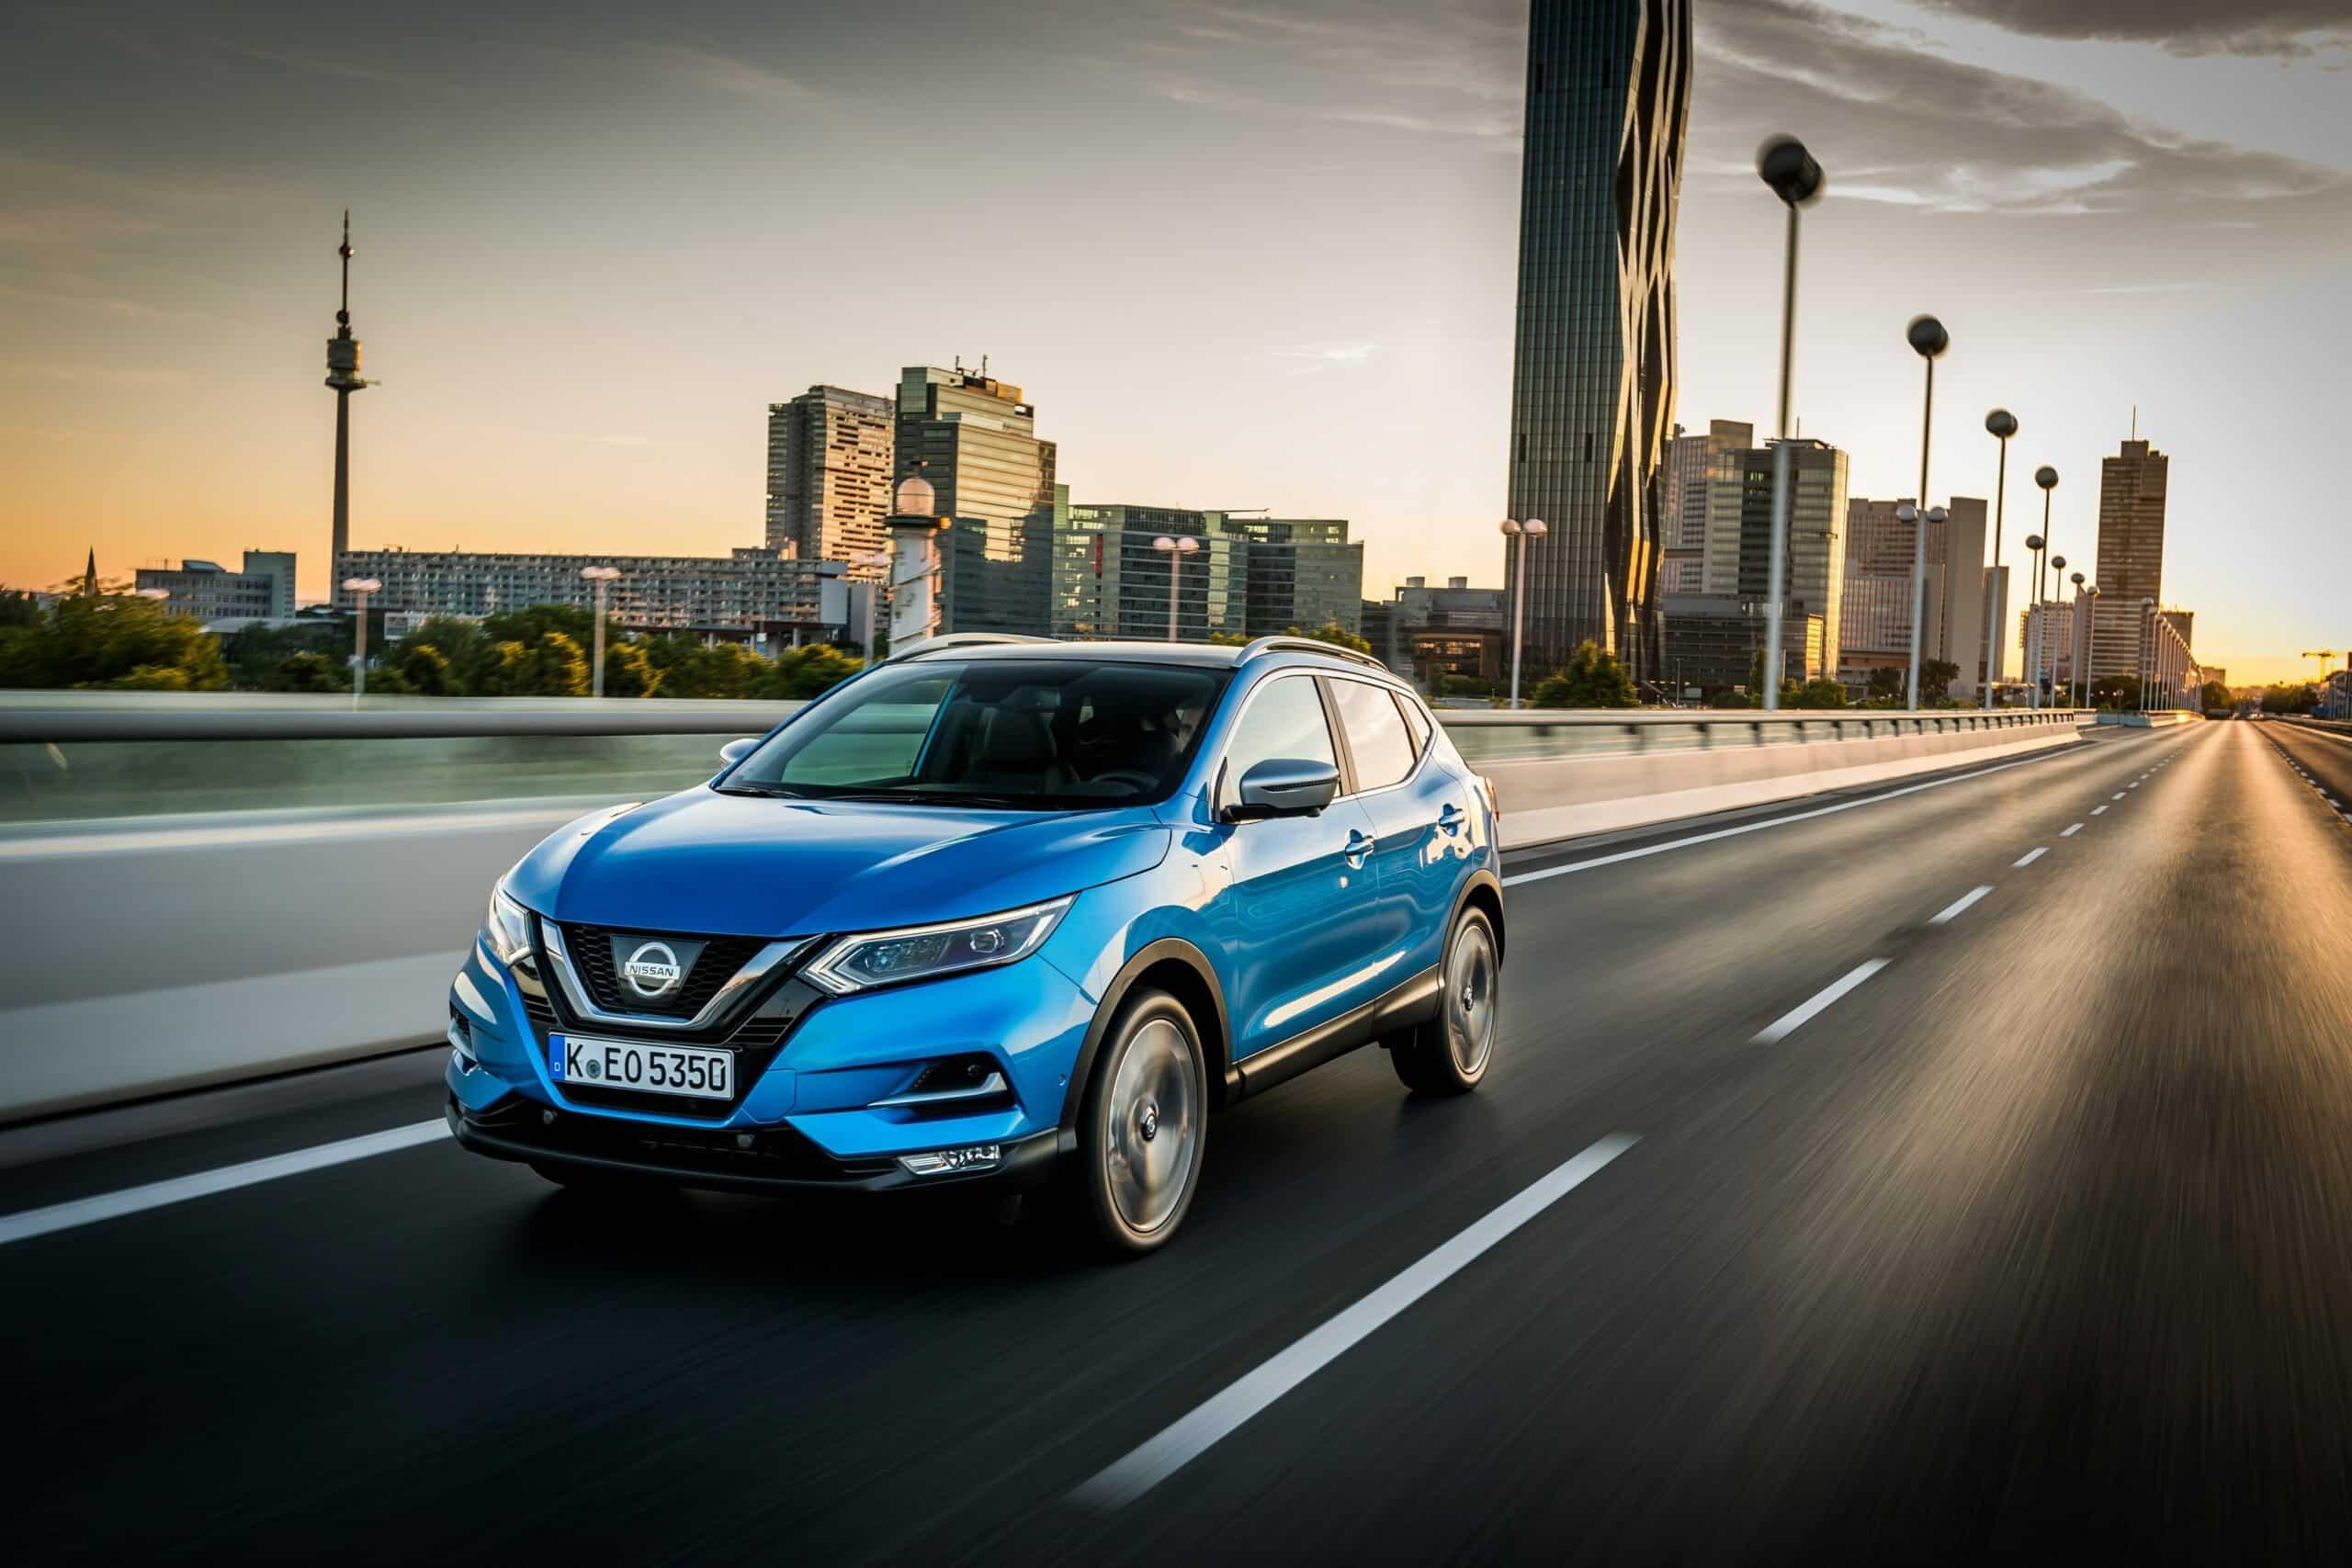 Nissan Qashqai 2018 - Camping, Cars & Caravans